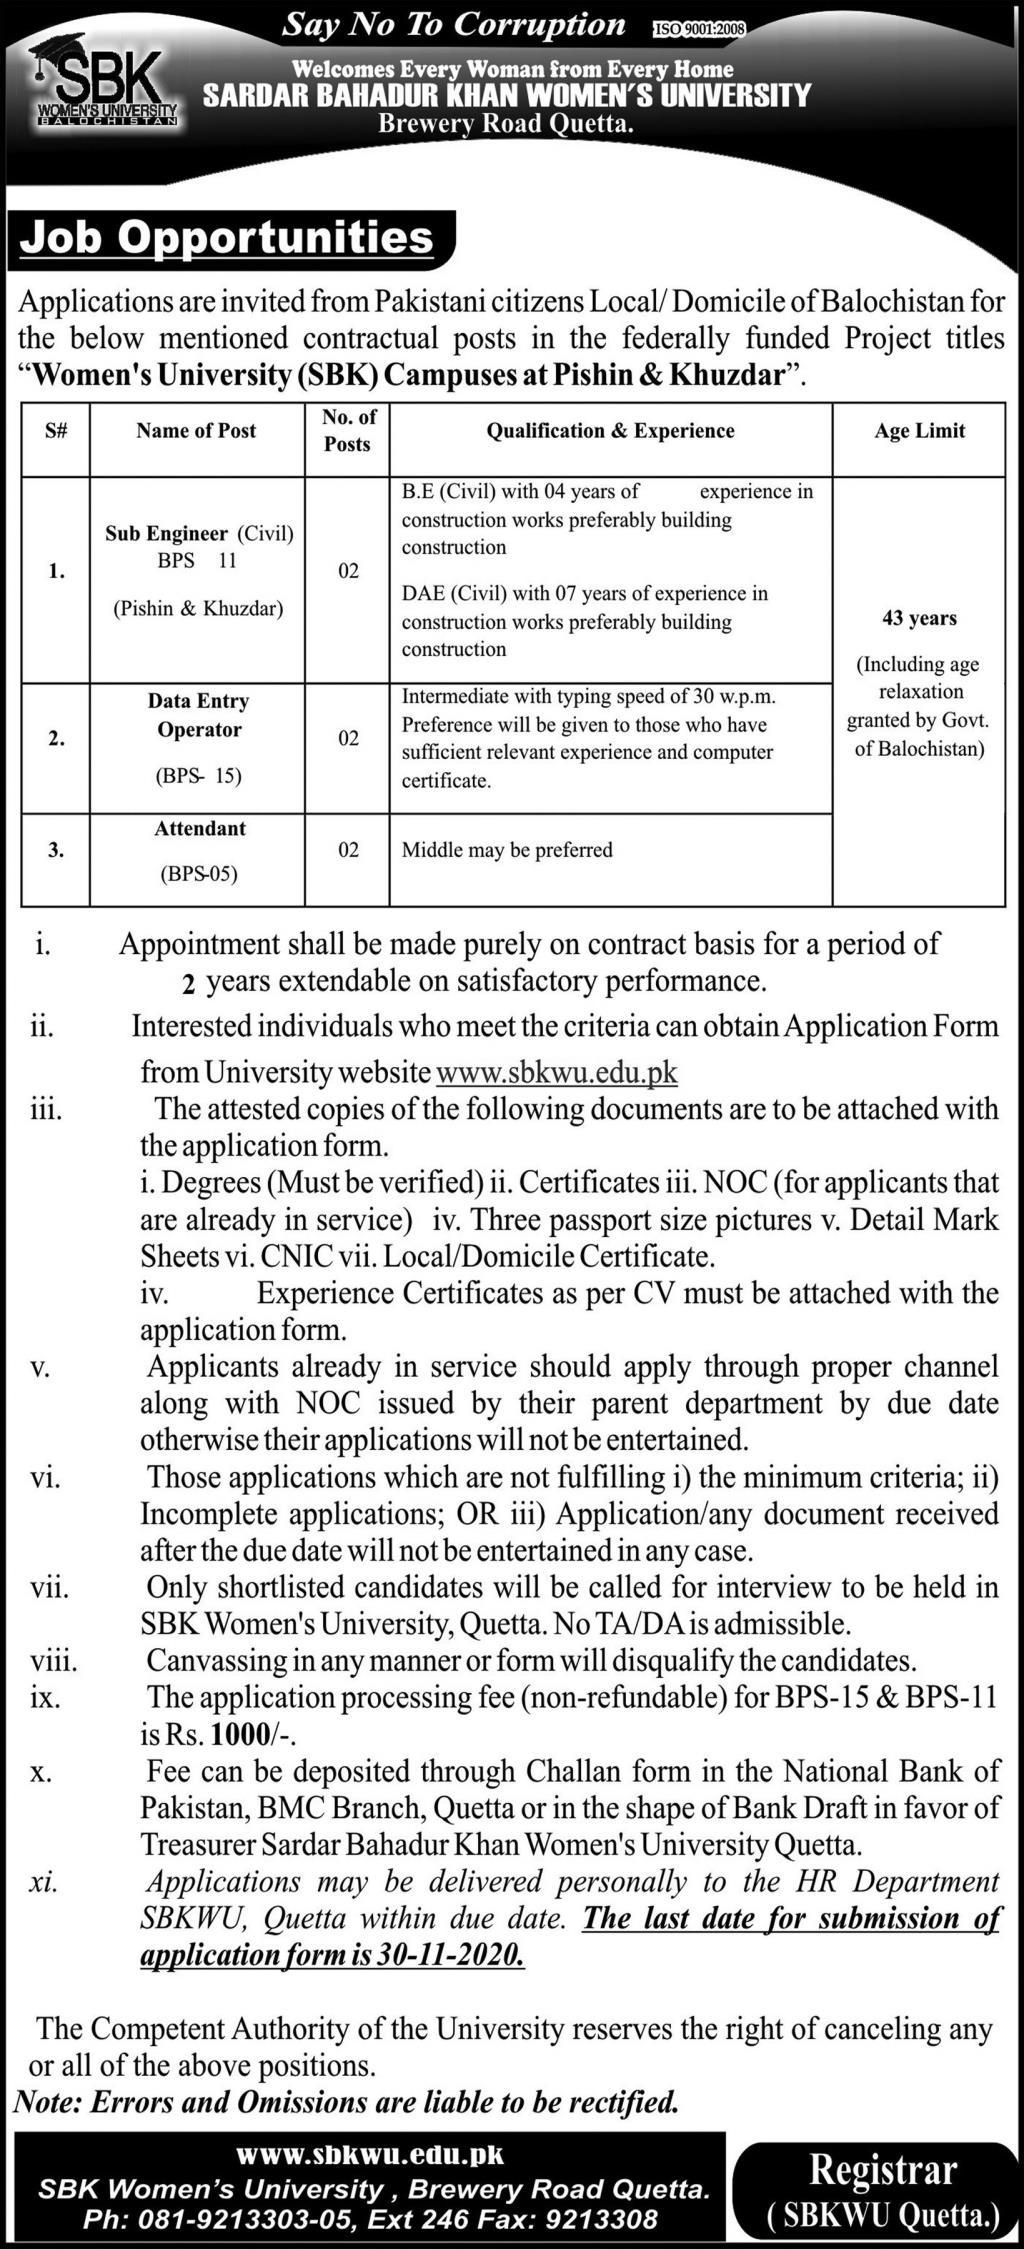 Sardar Bahadur Khan Women University SBKWU Jobs in Pakistan - Download Job Application Form - www.sbkwu.edu.pk Jobs 2021